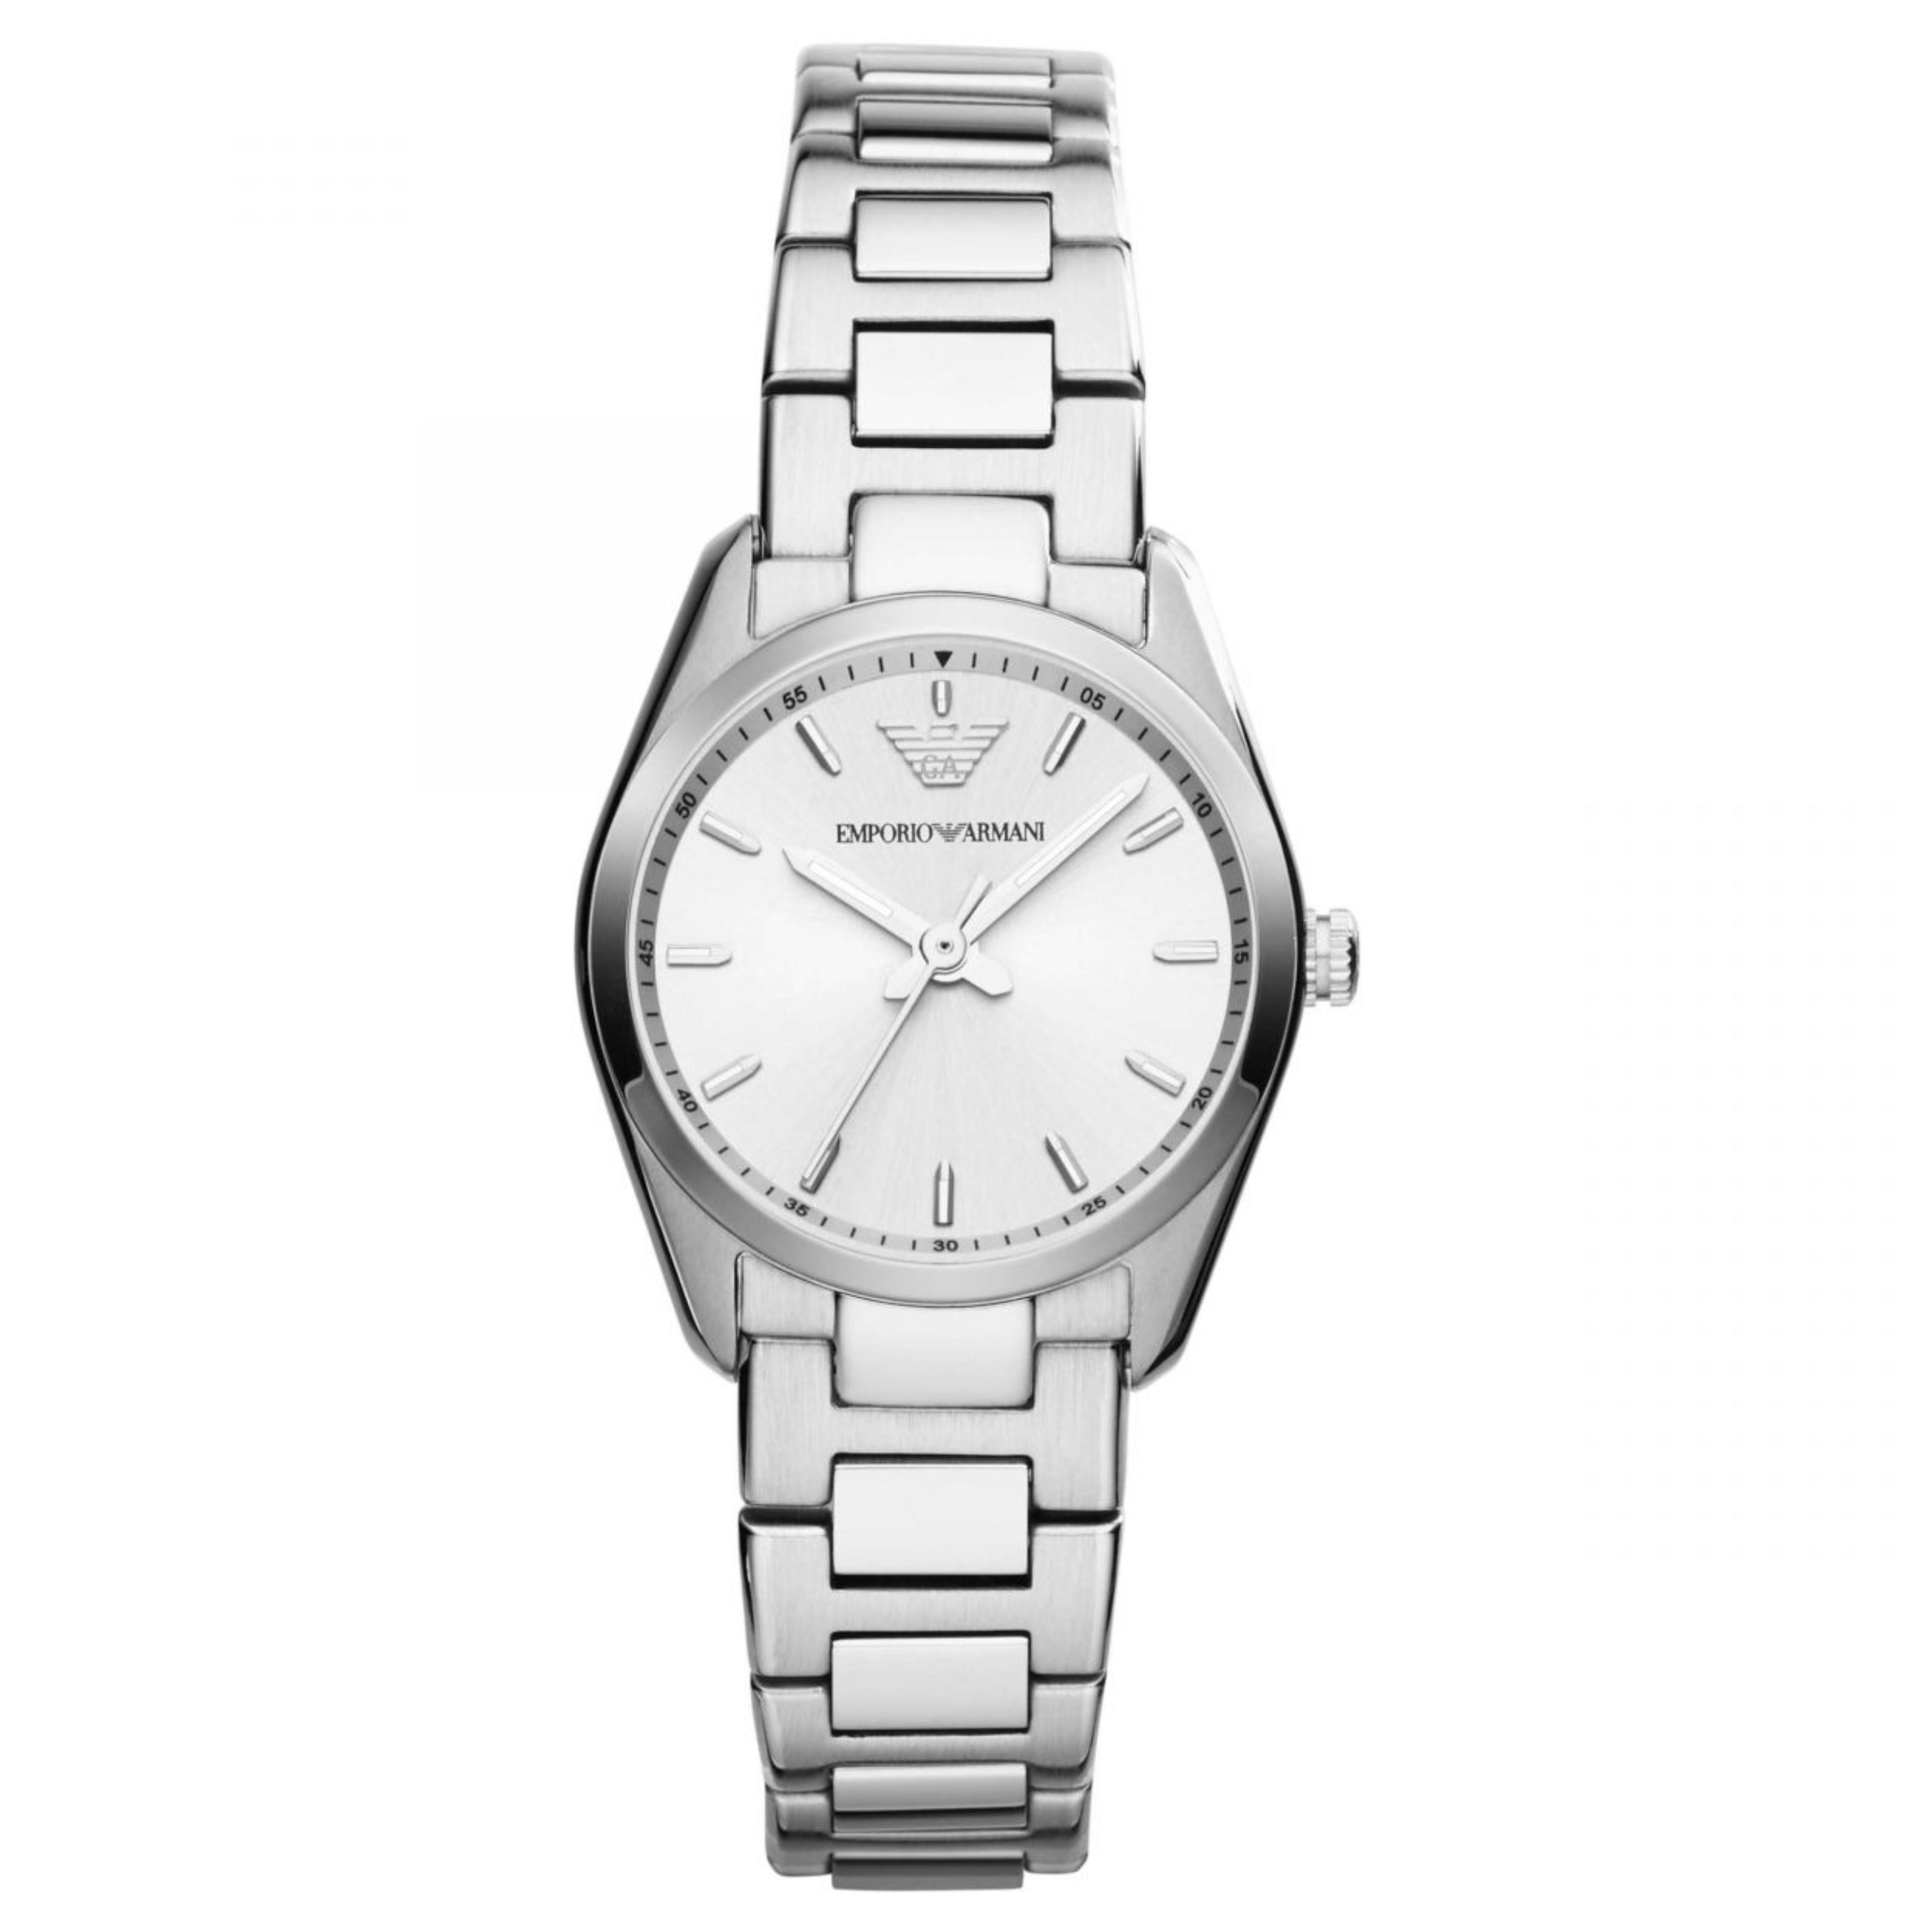 Emporio Armani Women's Formal Watch|Silver Case Round Dial|Bracelet Strap|AR6028